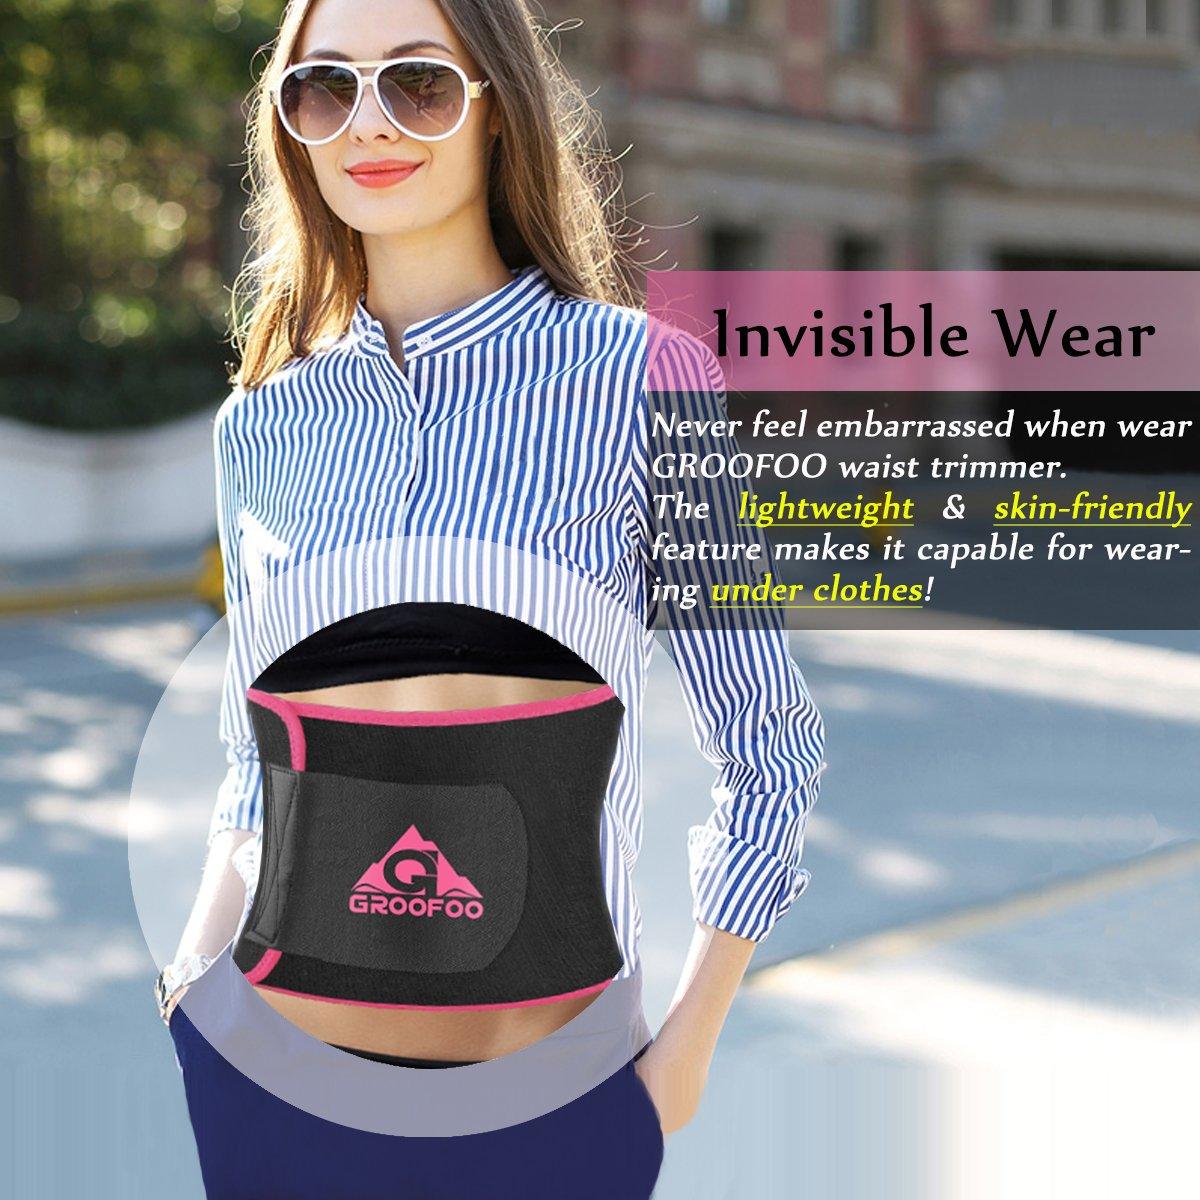 Cintura Dimagrante Regolabile,GROOFOO Fascia Addominale Dimagrante Snellente per Uomo e Donna,Cintura Per Dimagrire